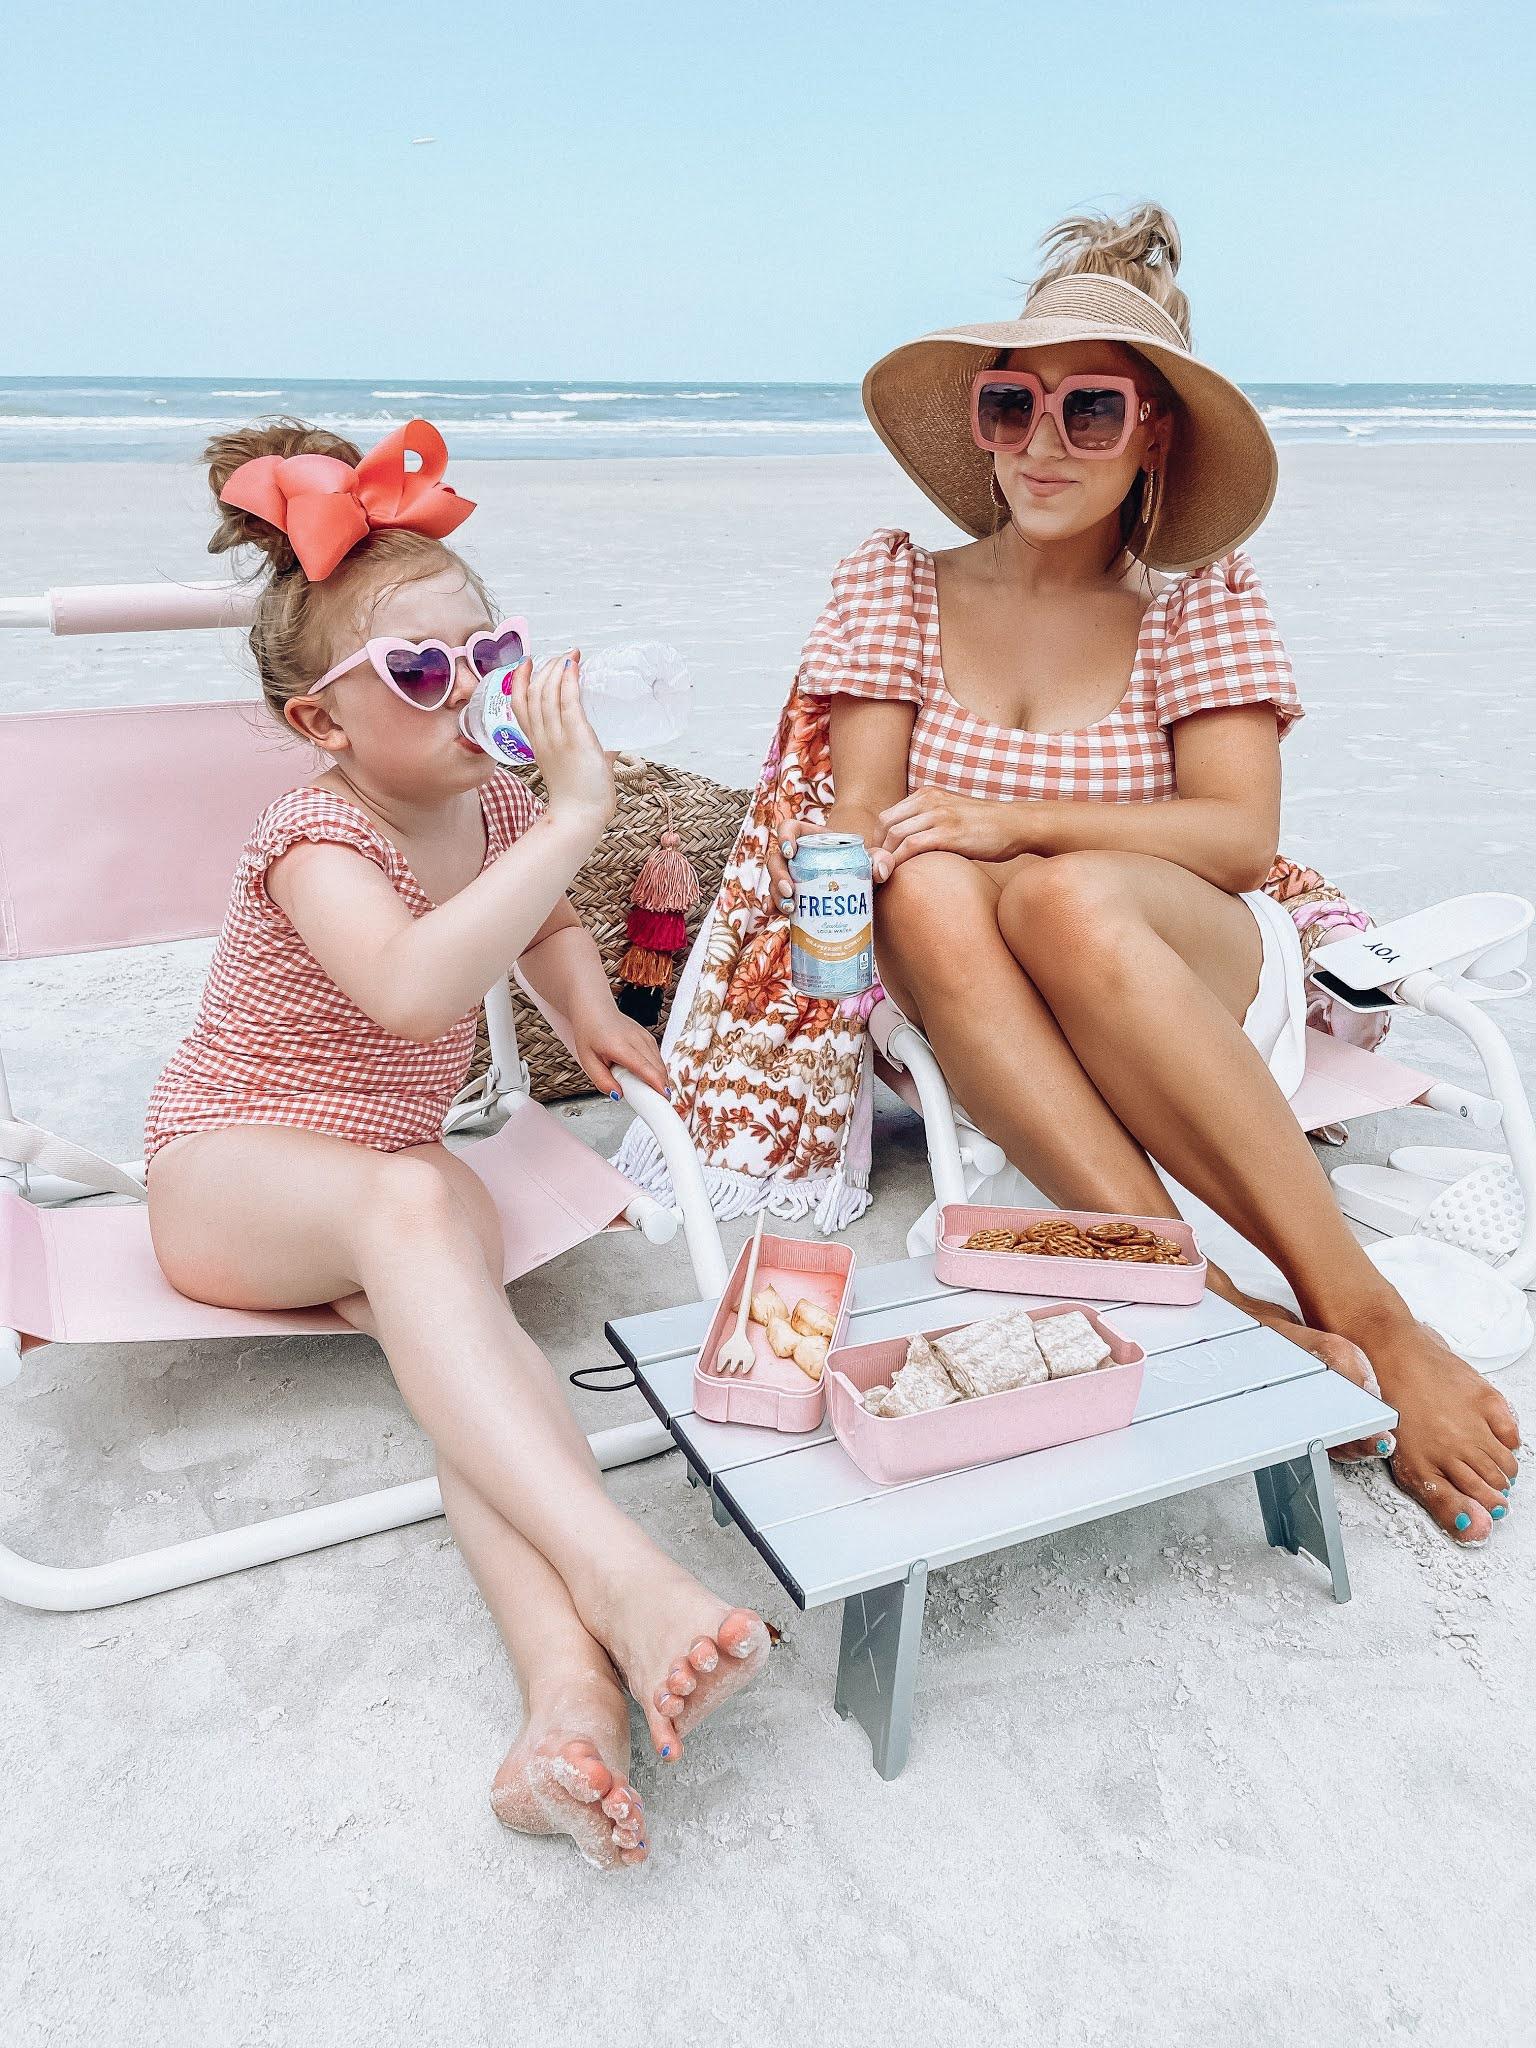 Gingham Beach Day + Summer Lunch & Snack Ideas - Something Delightful Blog #summerlunch #lunchforkids #snackideas #beachlunch #gingham #mommyandme